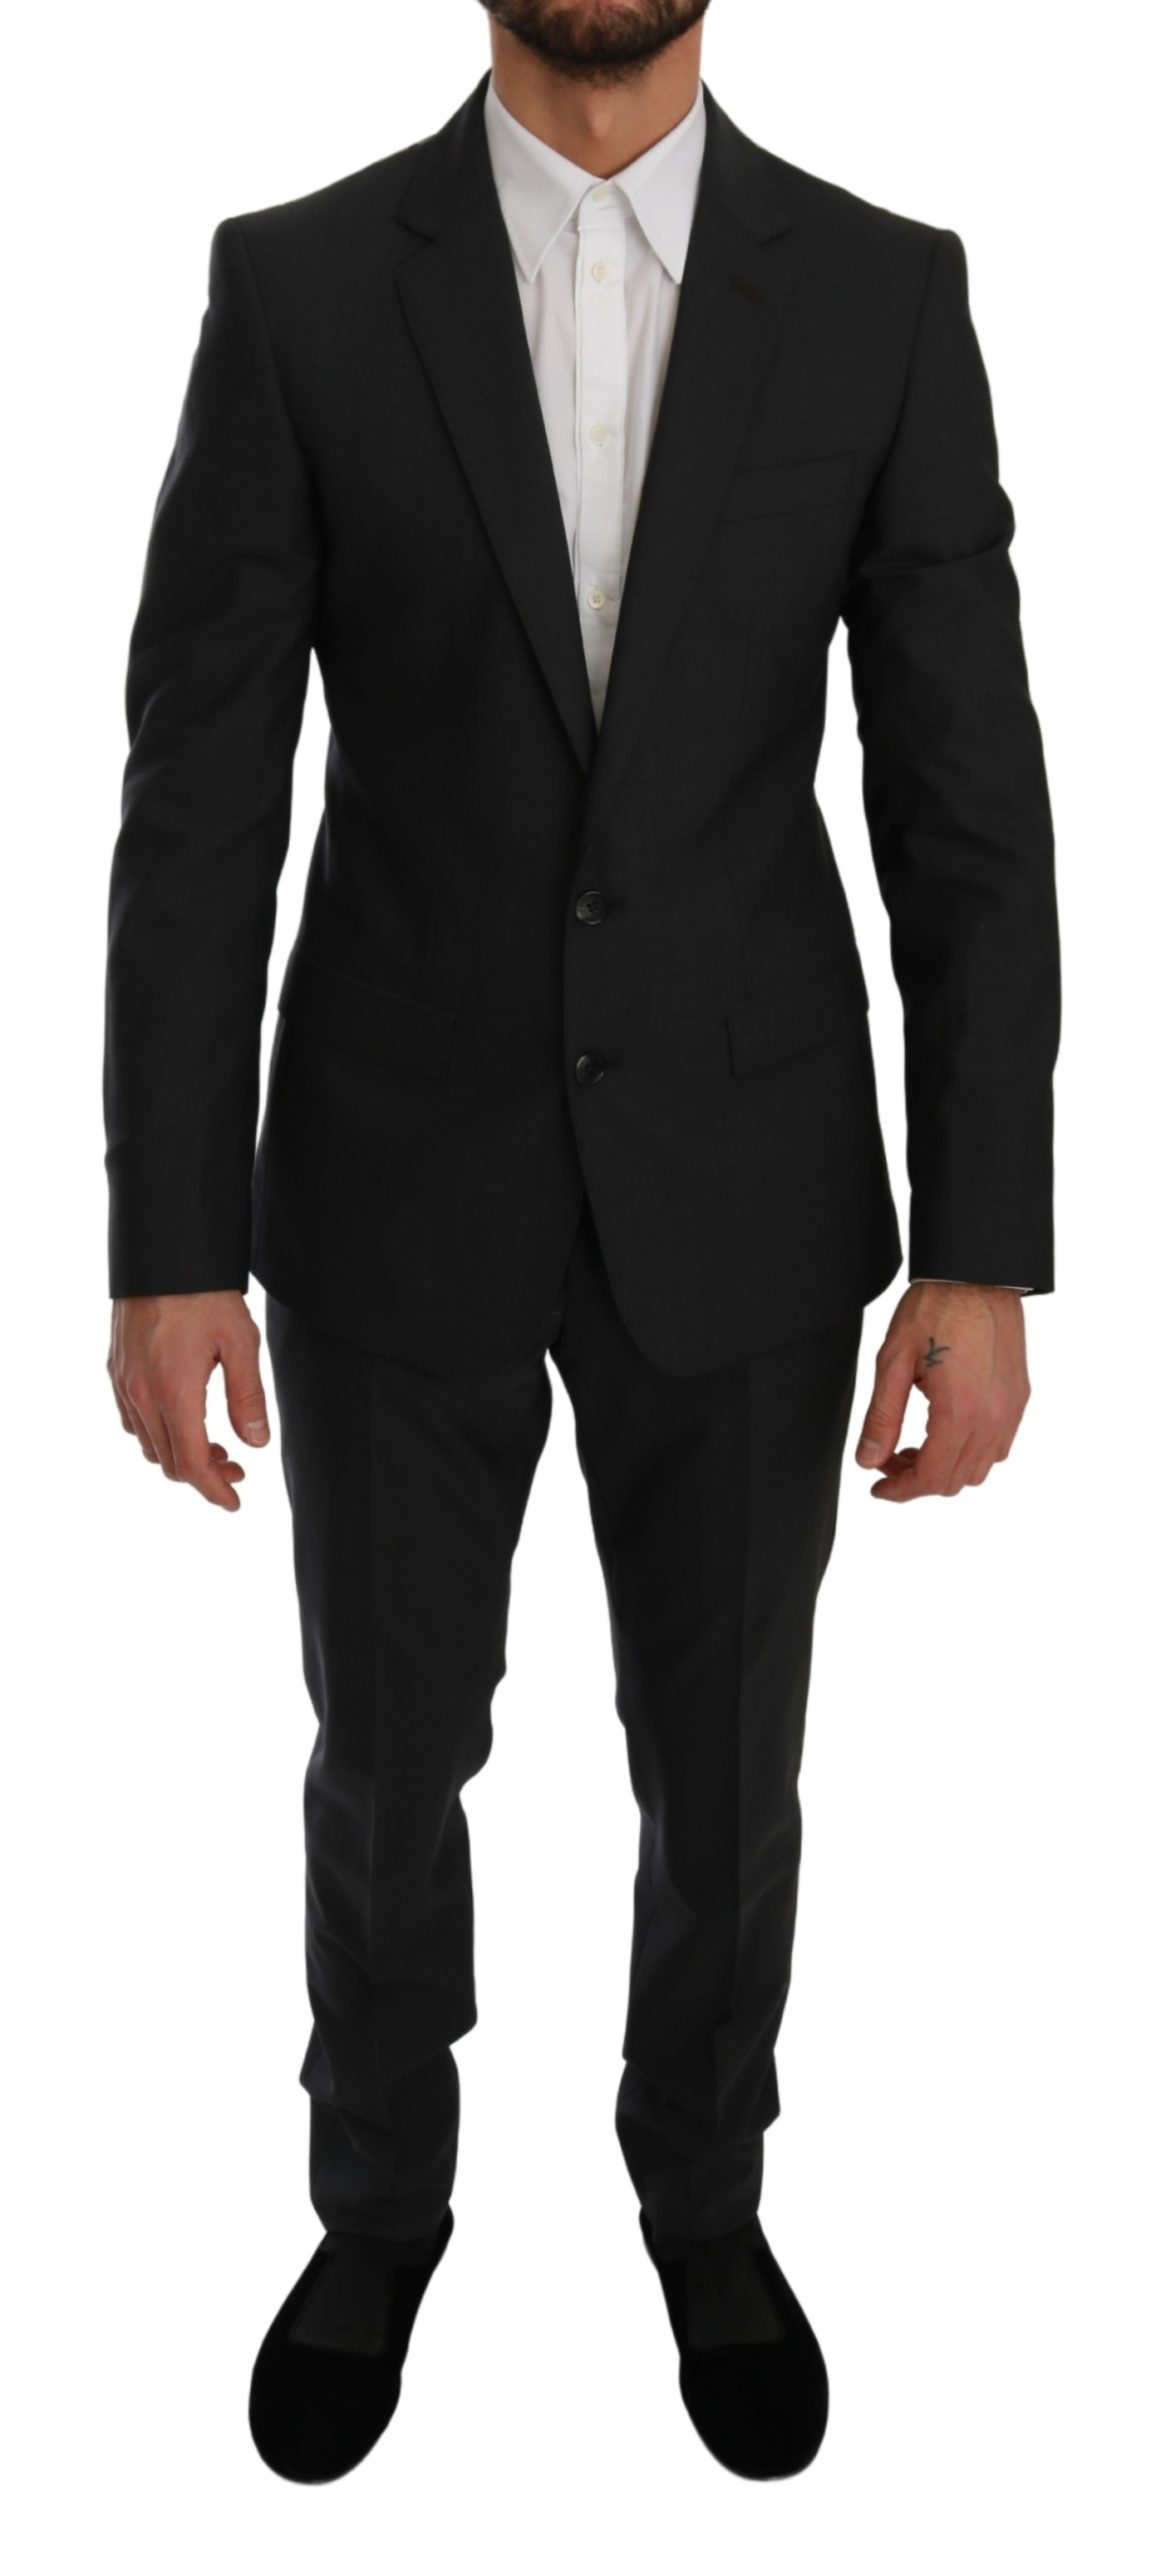 Dolce & Gabbana Men's Slim Fit 2 Piece MARTINI Suit Gray KOS1756 - IT46 | S